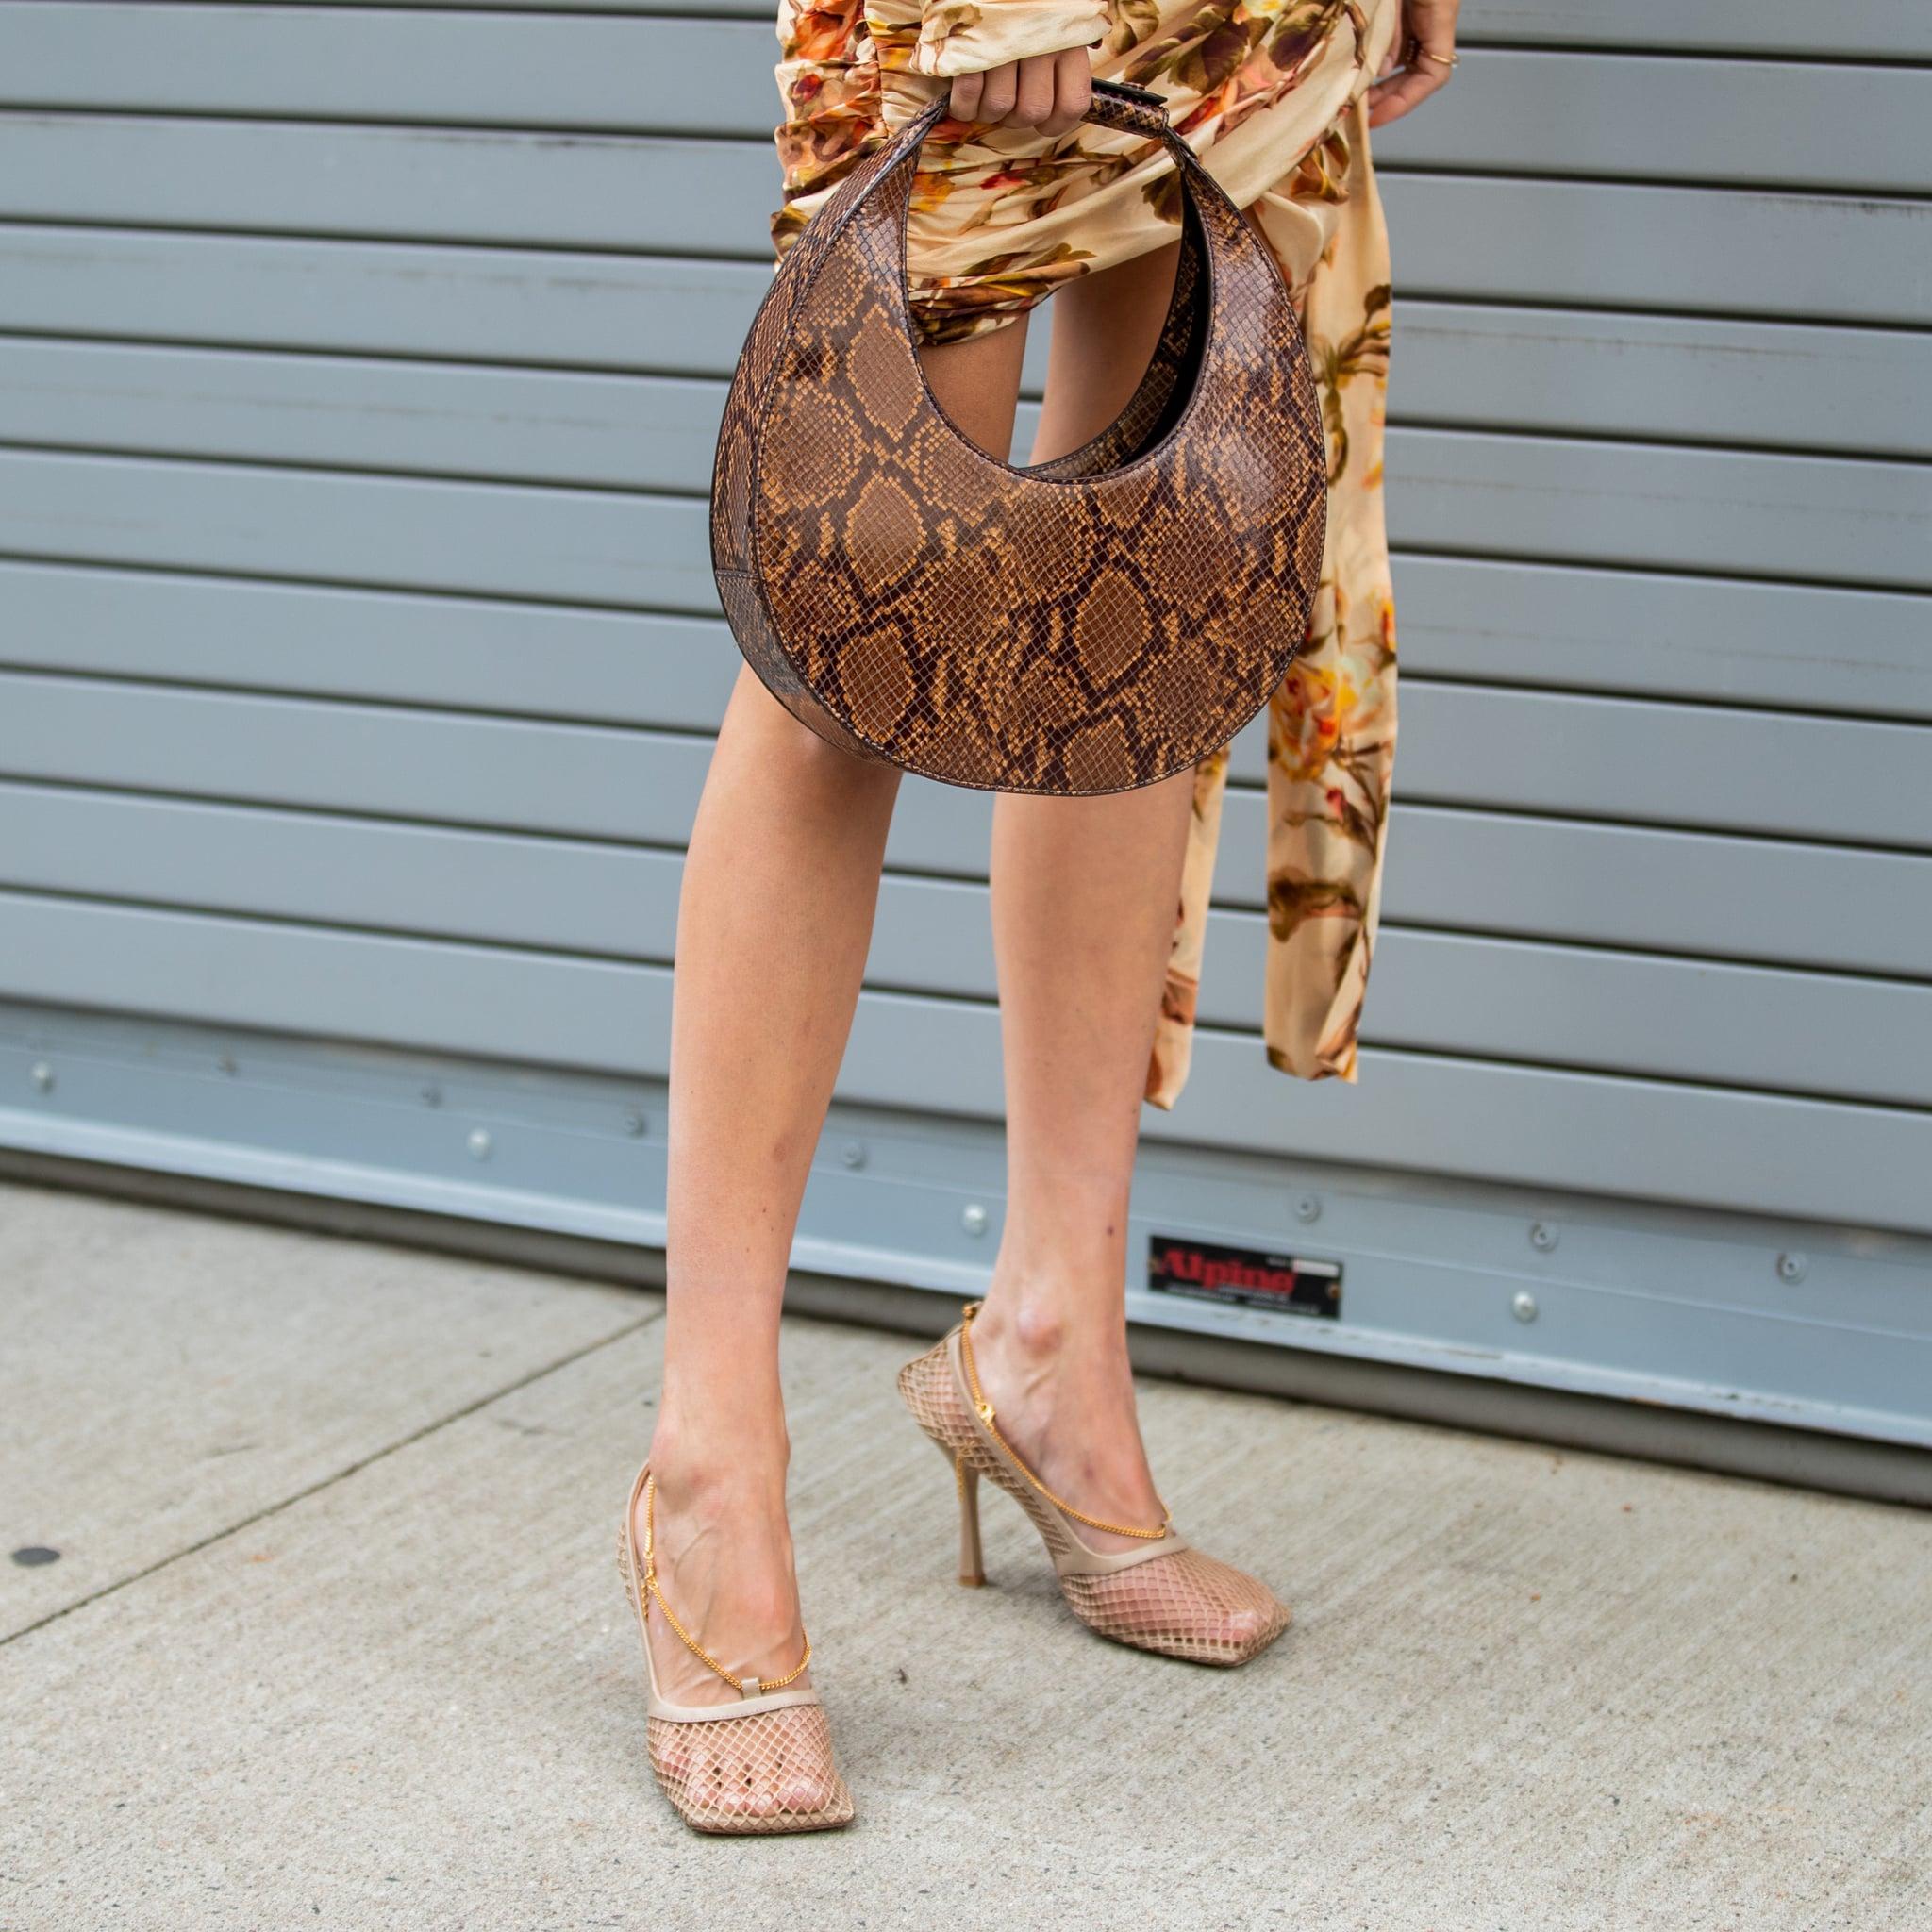 Topshop Nicole Burgundy Strap Sandals